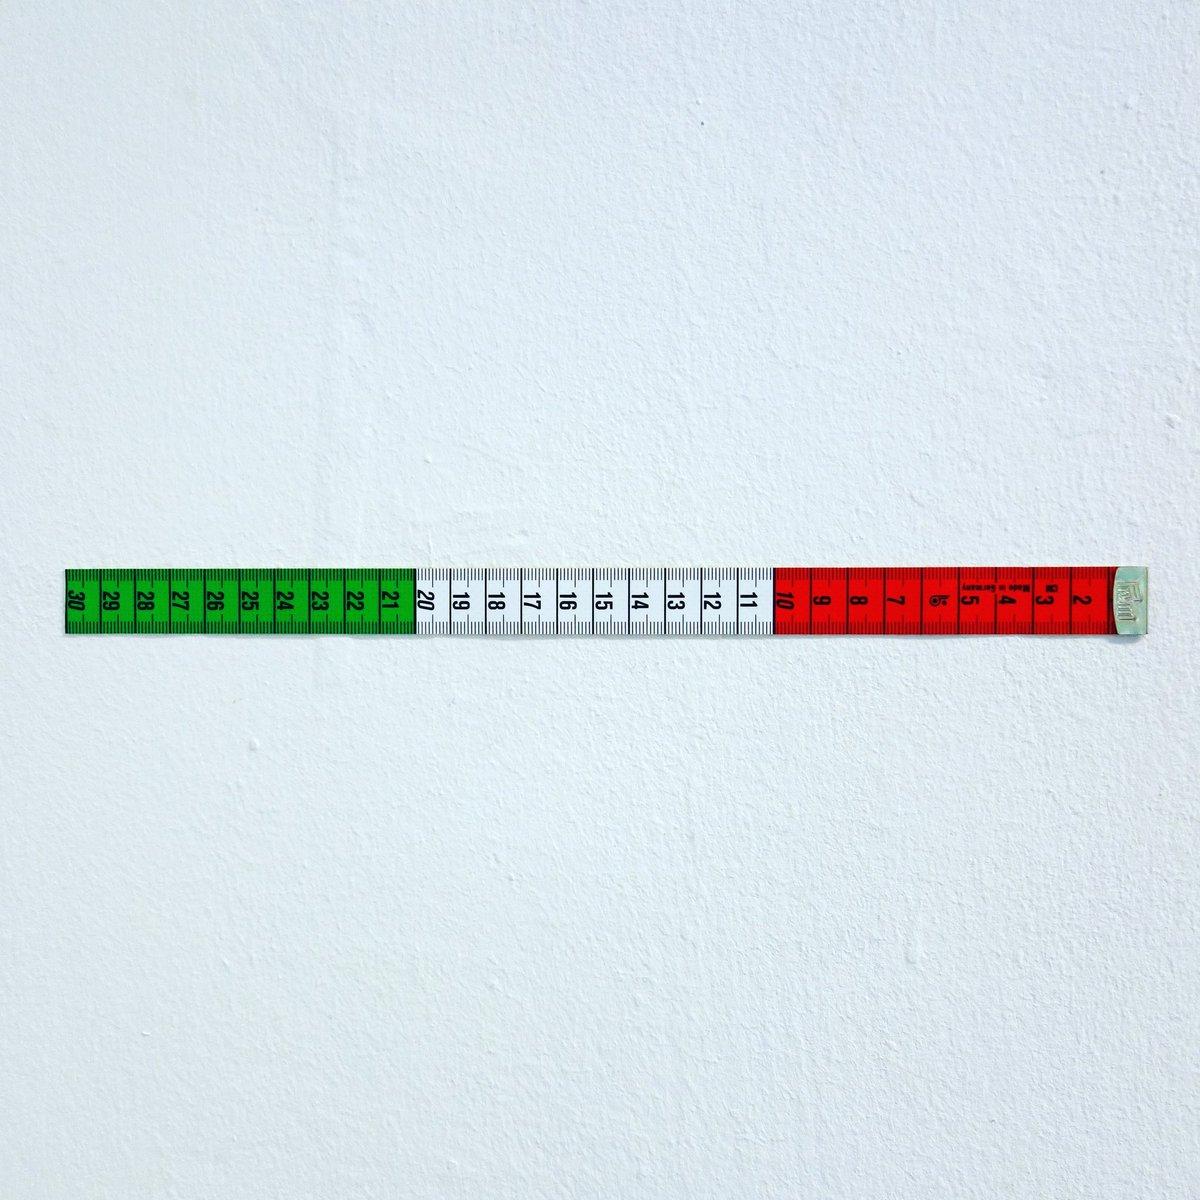 ITALIAN FLAG 30 CM Matthias Braun 2020 30 x 1,8 cm tailor measuring tape, cut #matthiasbraun #contemporaryart #contemporaryartist #tailormeasuringtape #flag  #minimalart #conceptualart #minimalism #italy #kunstinstallation #white #artinstallation #kunst #red #green #artobjectpic.twitter.com/hQCA81ueOY